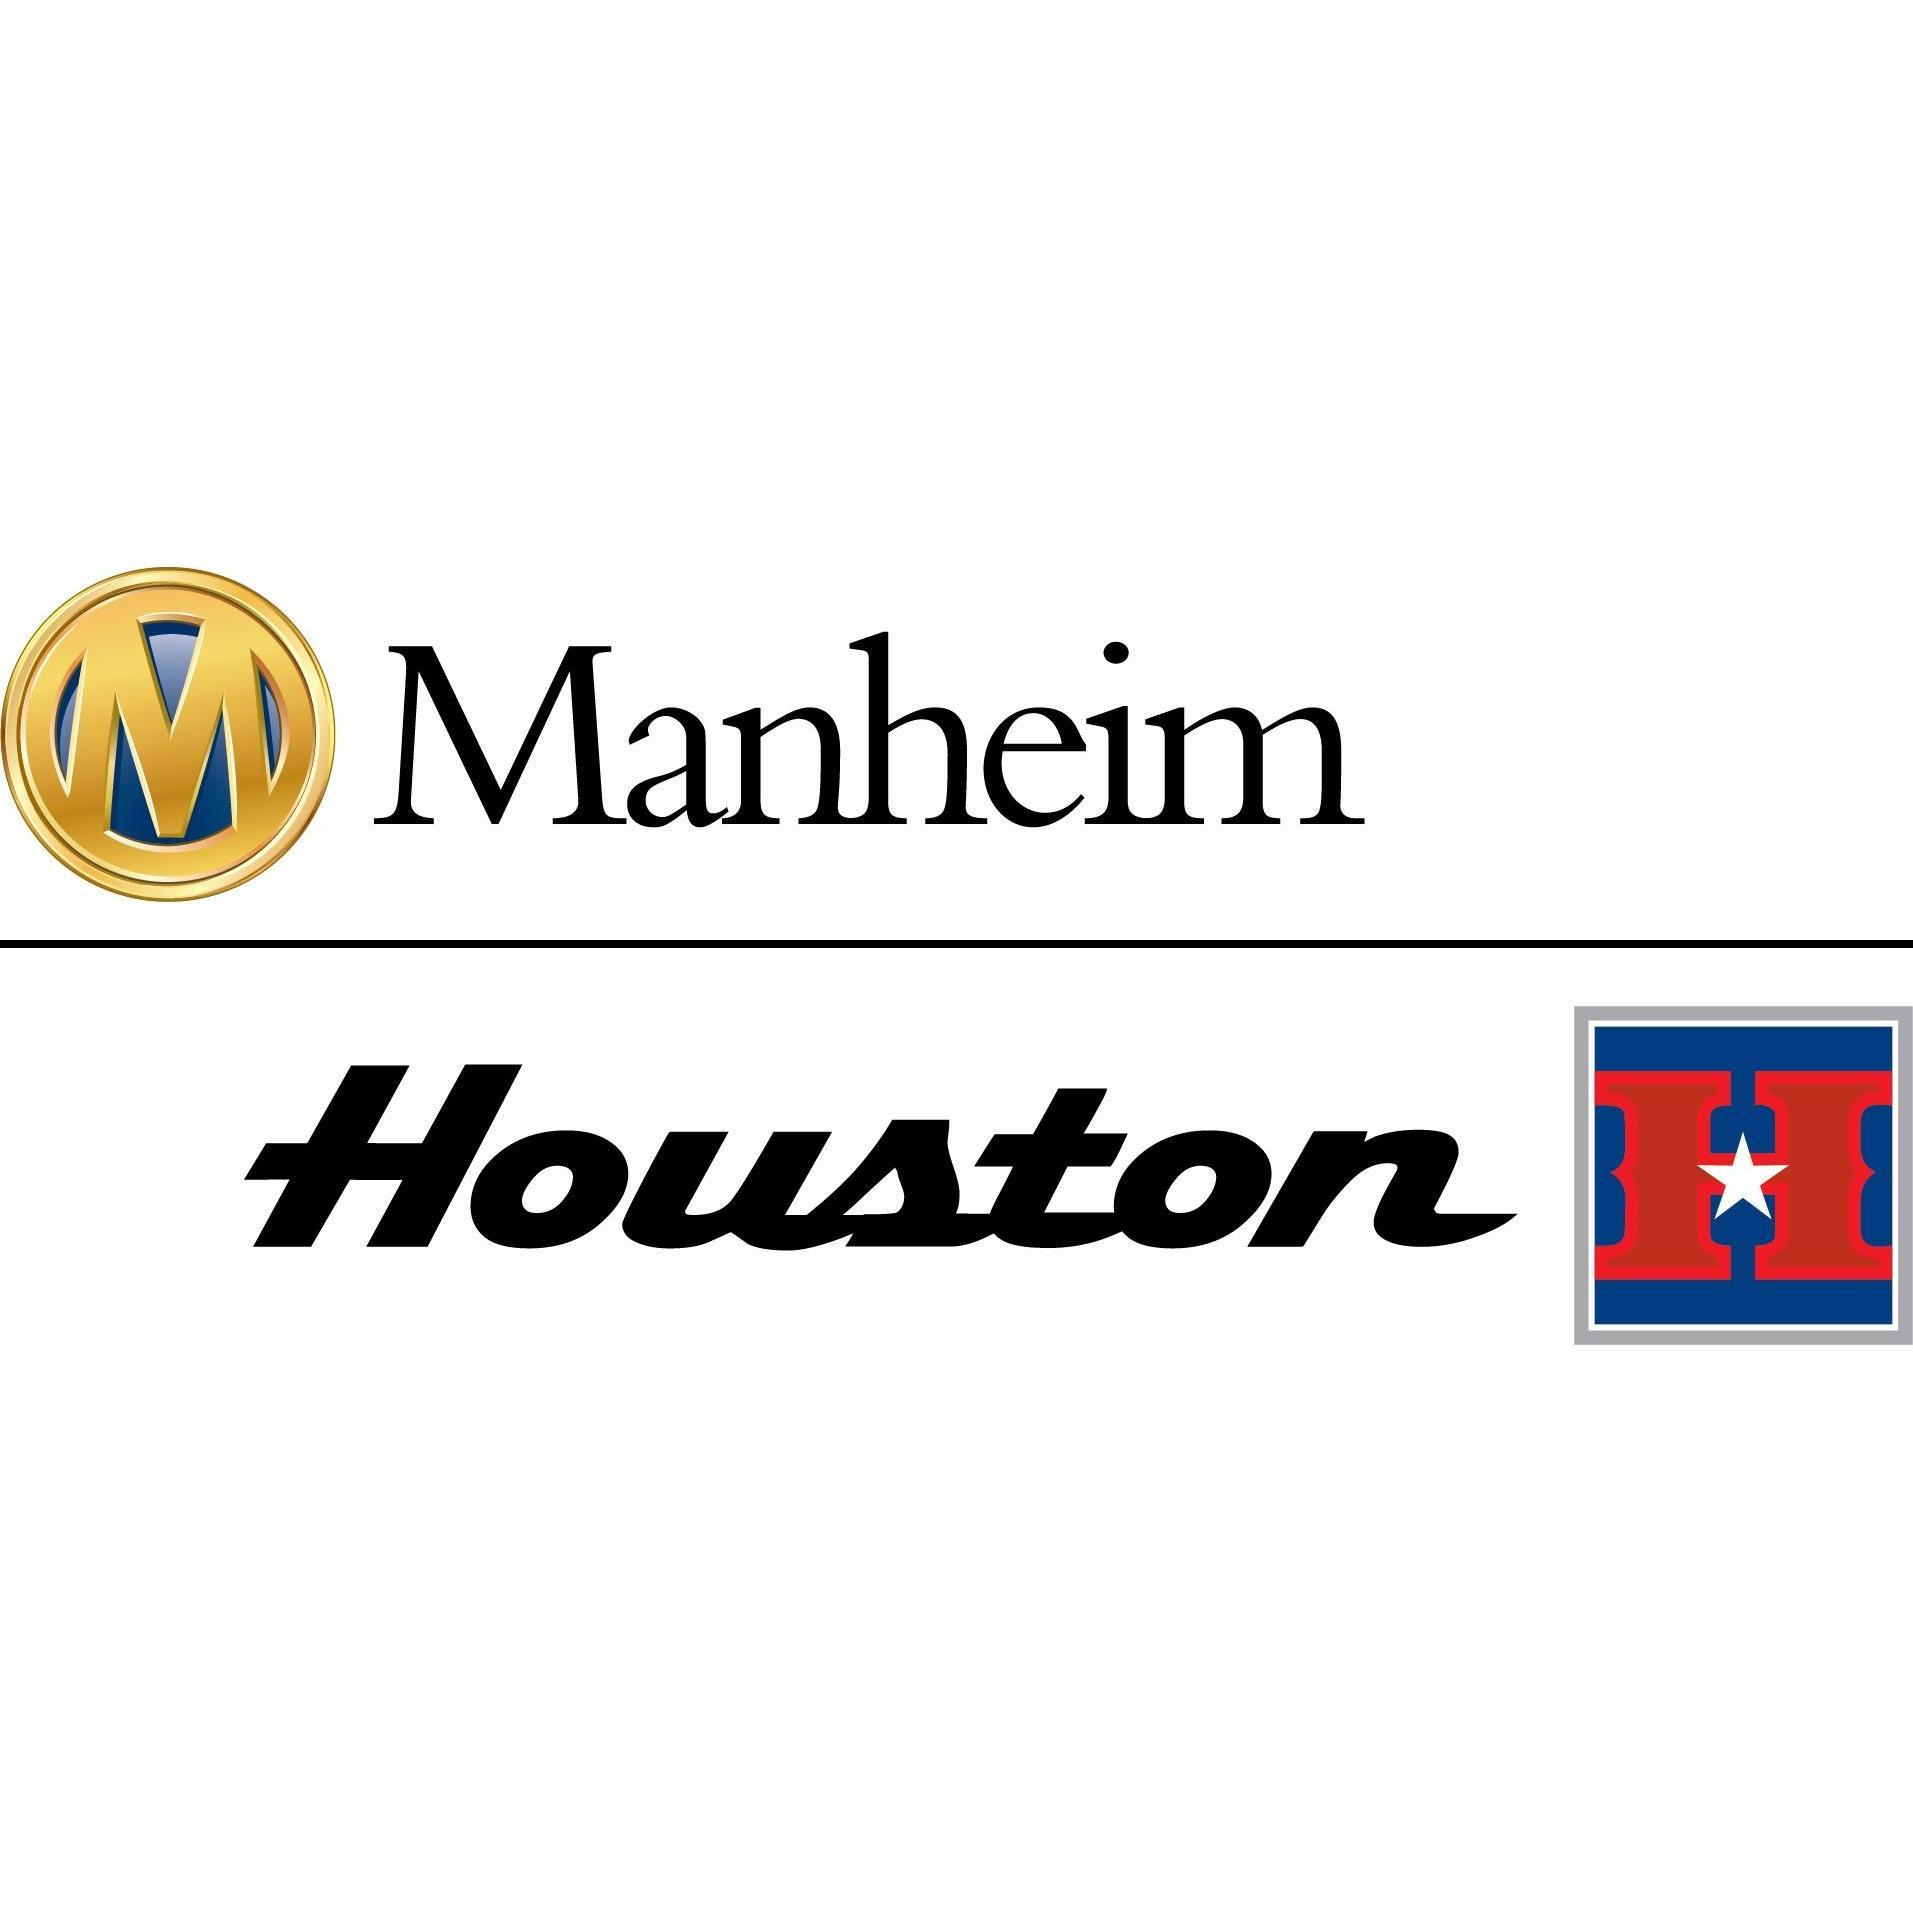 Manheim houston auto auctions houston tx reviews for A m motors houston tx